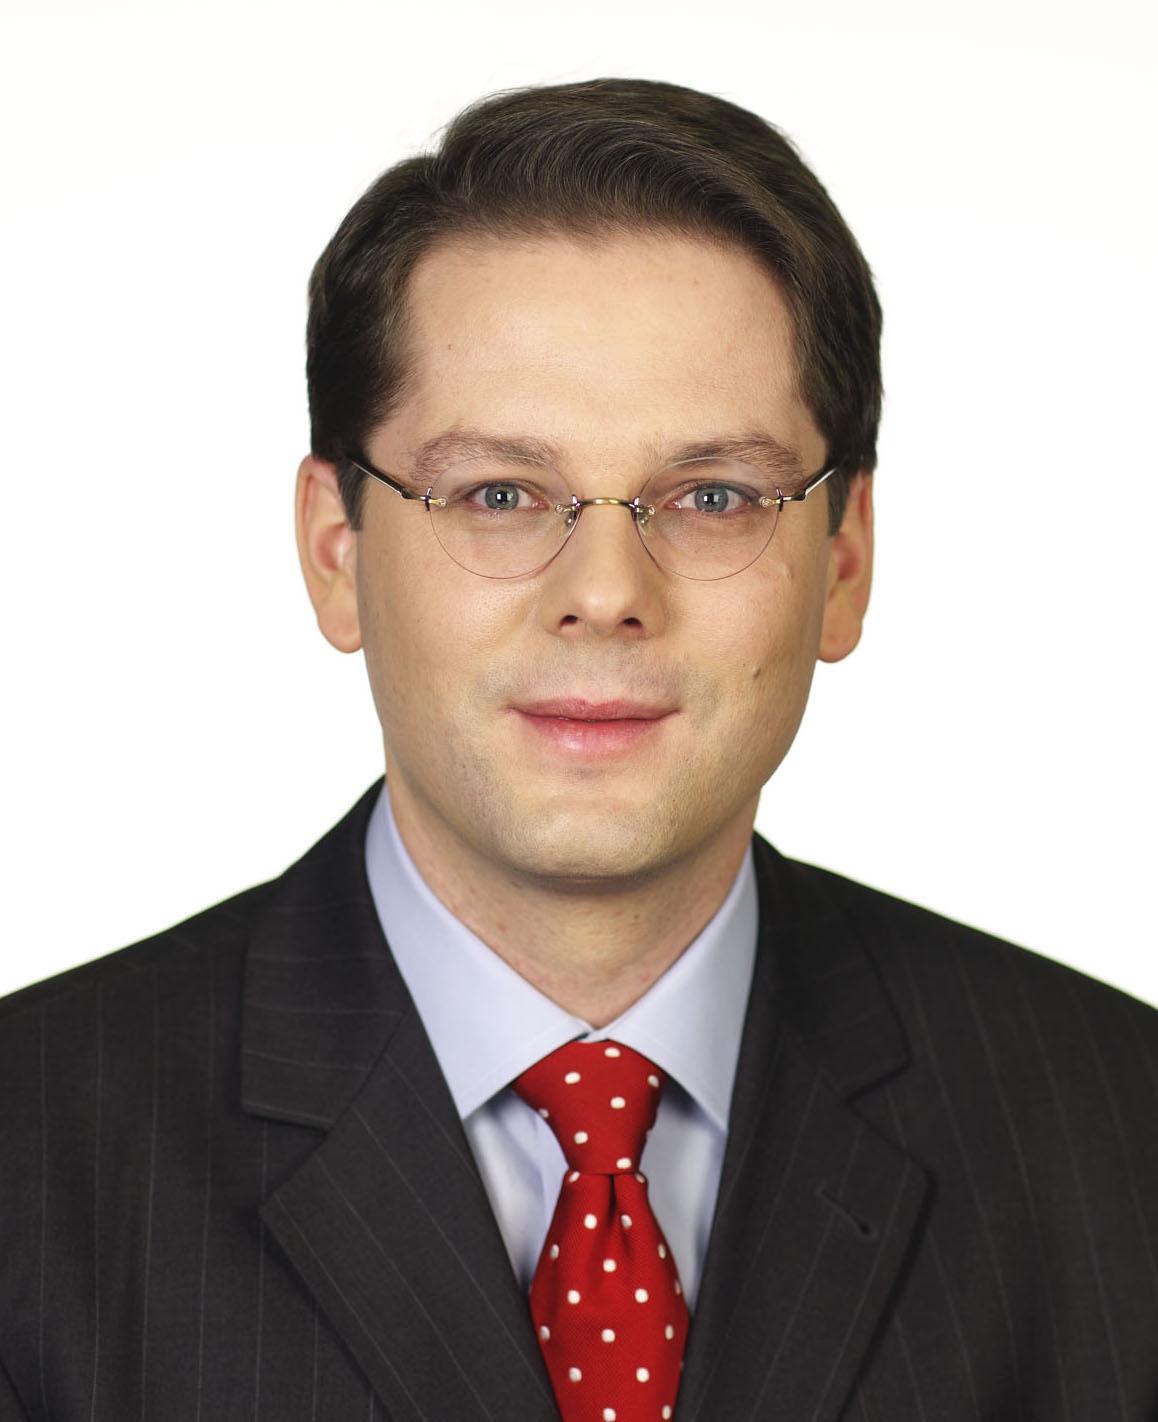 Dr. Christian Burholt